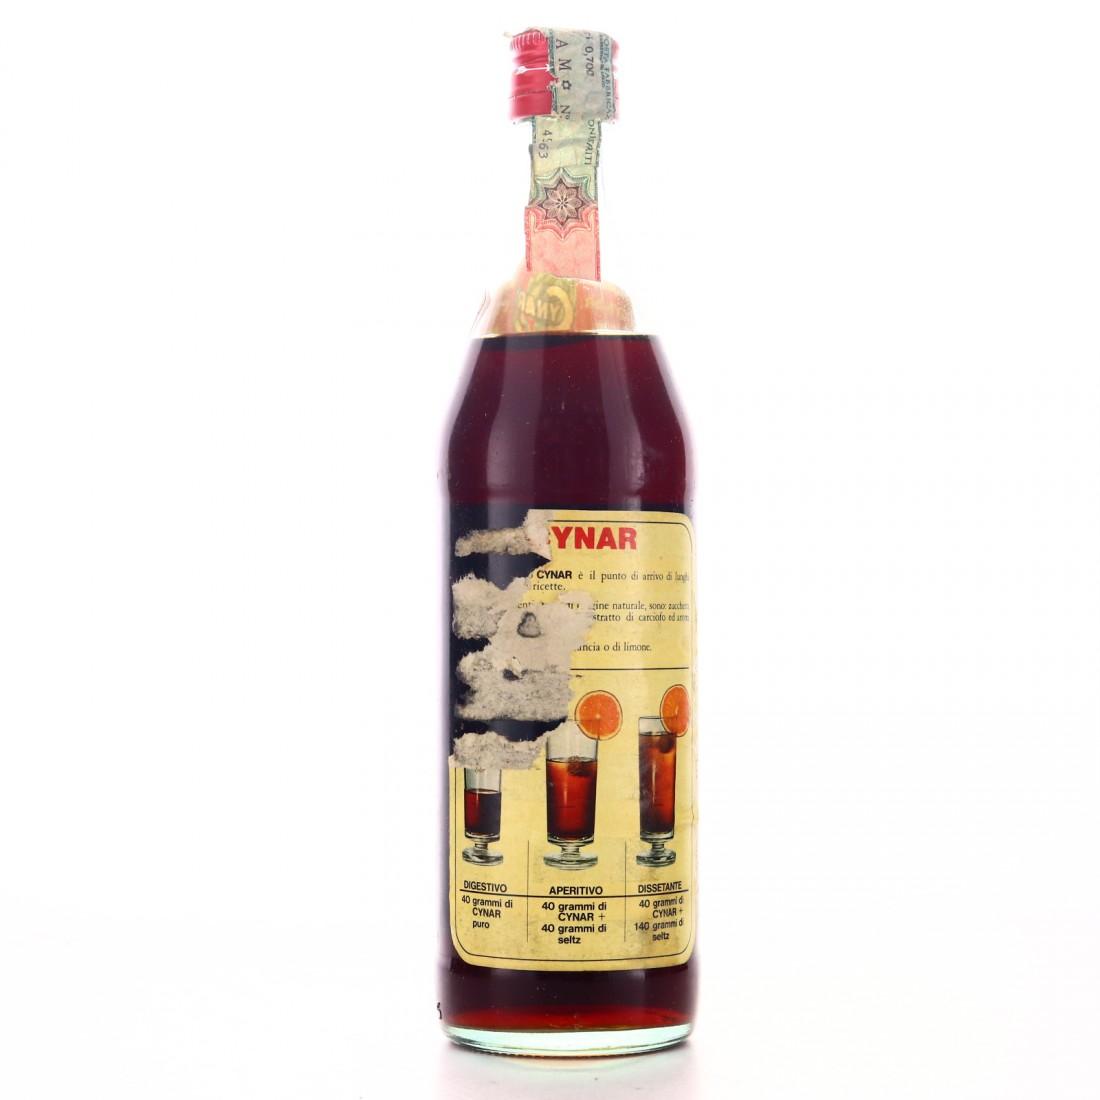 Cynar Artichoke Liqueur